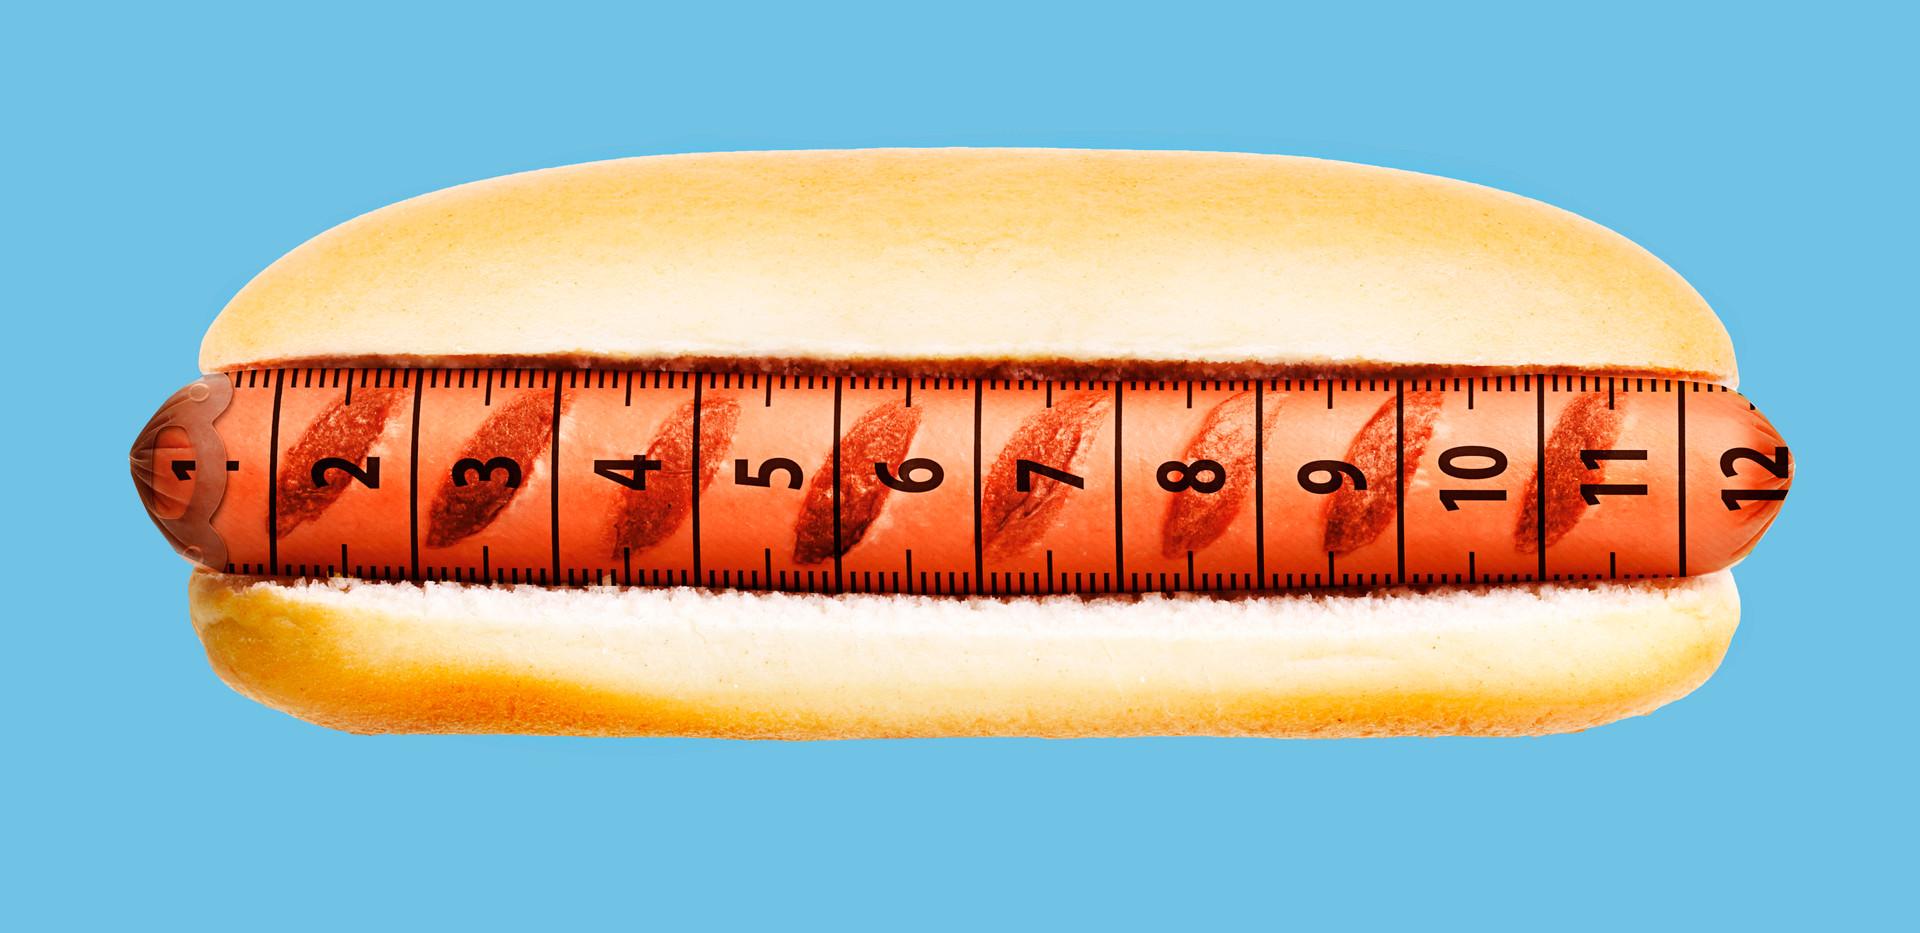 Hotdog sized.jpg